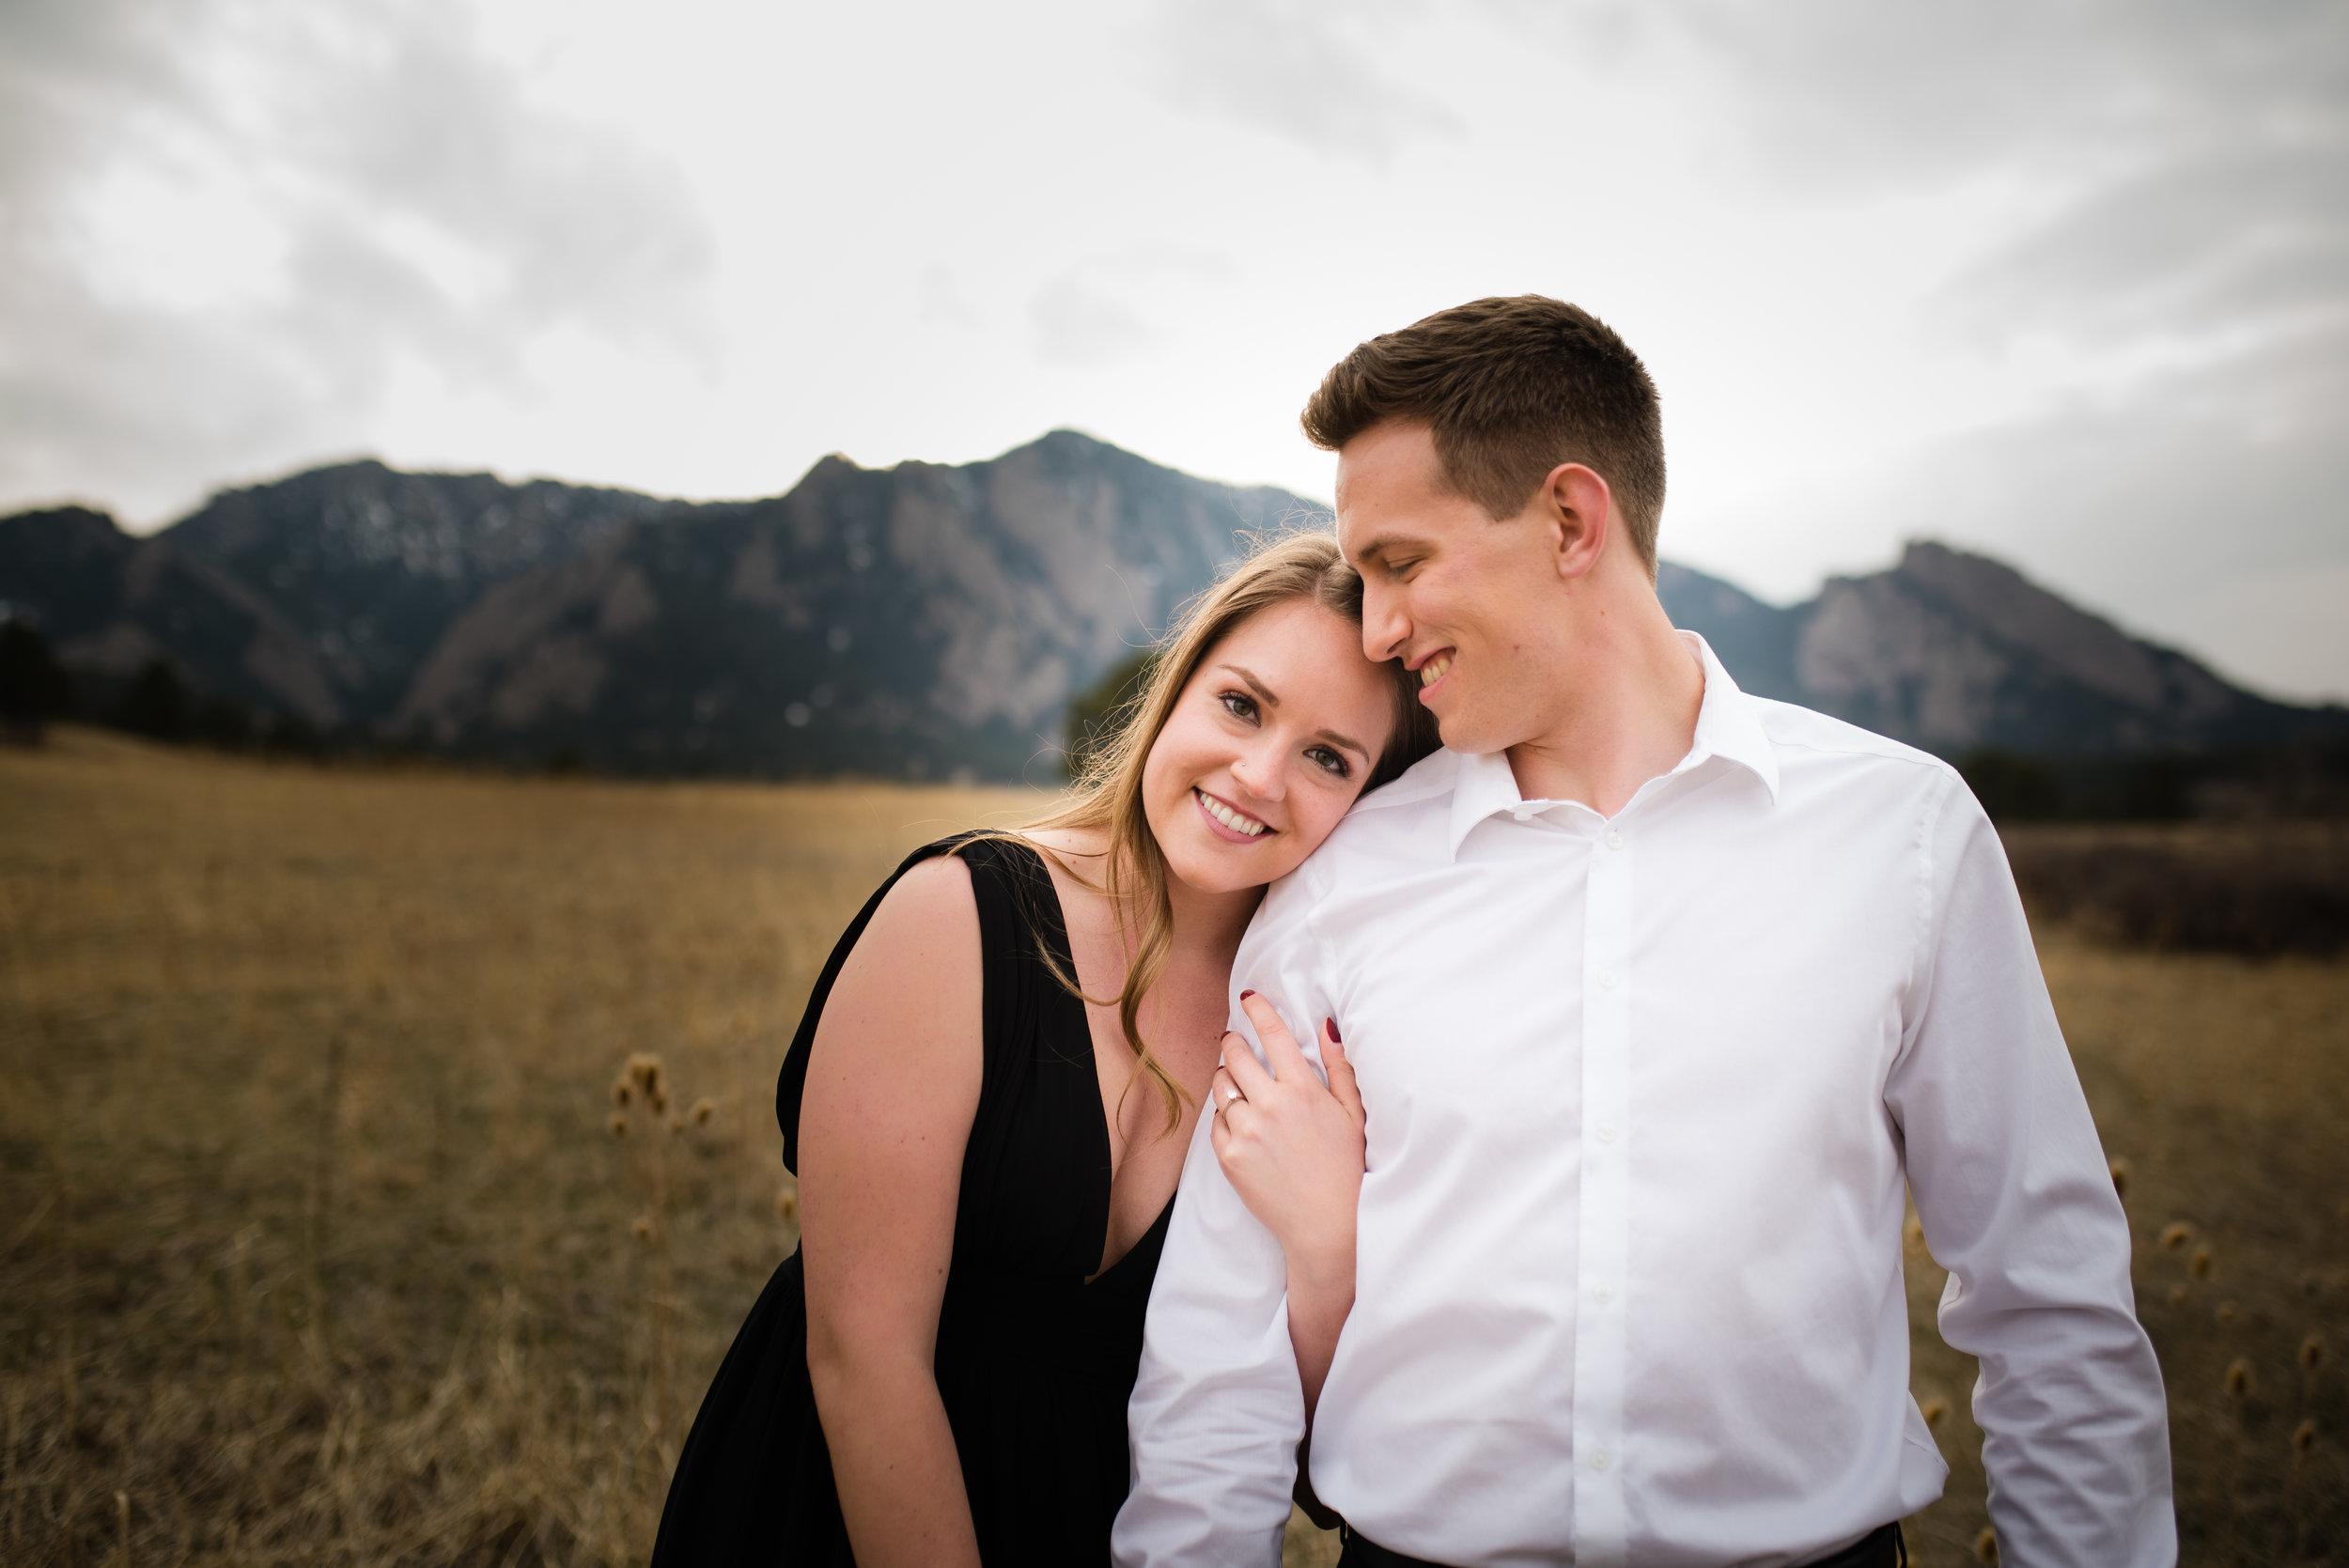 Colorado Engagement Photographer Jennie Bennett Photography  Sarah and Matt (23 of 1).jpg